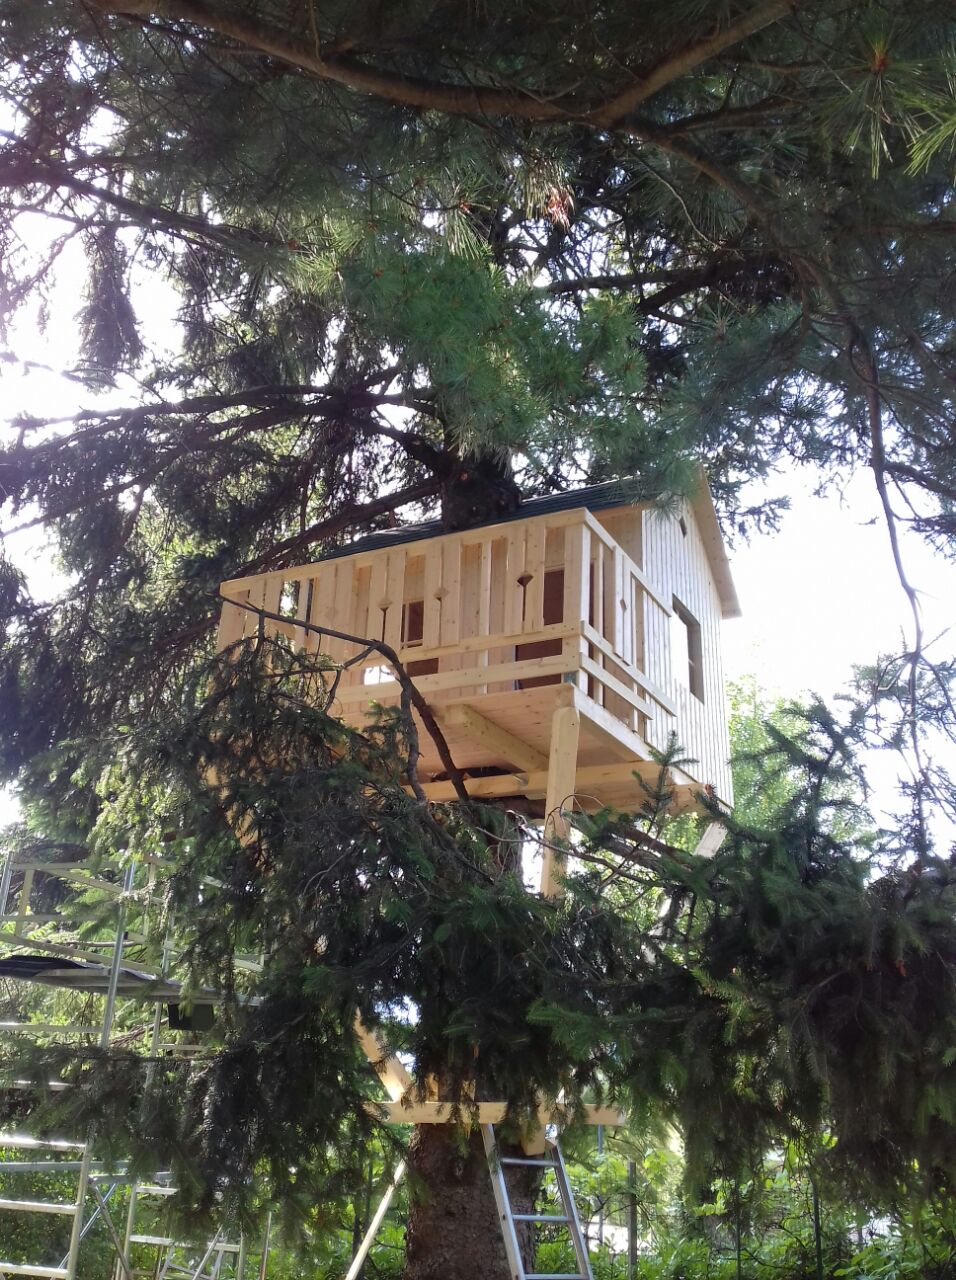 Casa albero trento artigiano casa tua for La tua casa trento